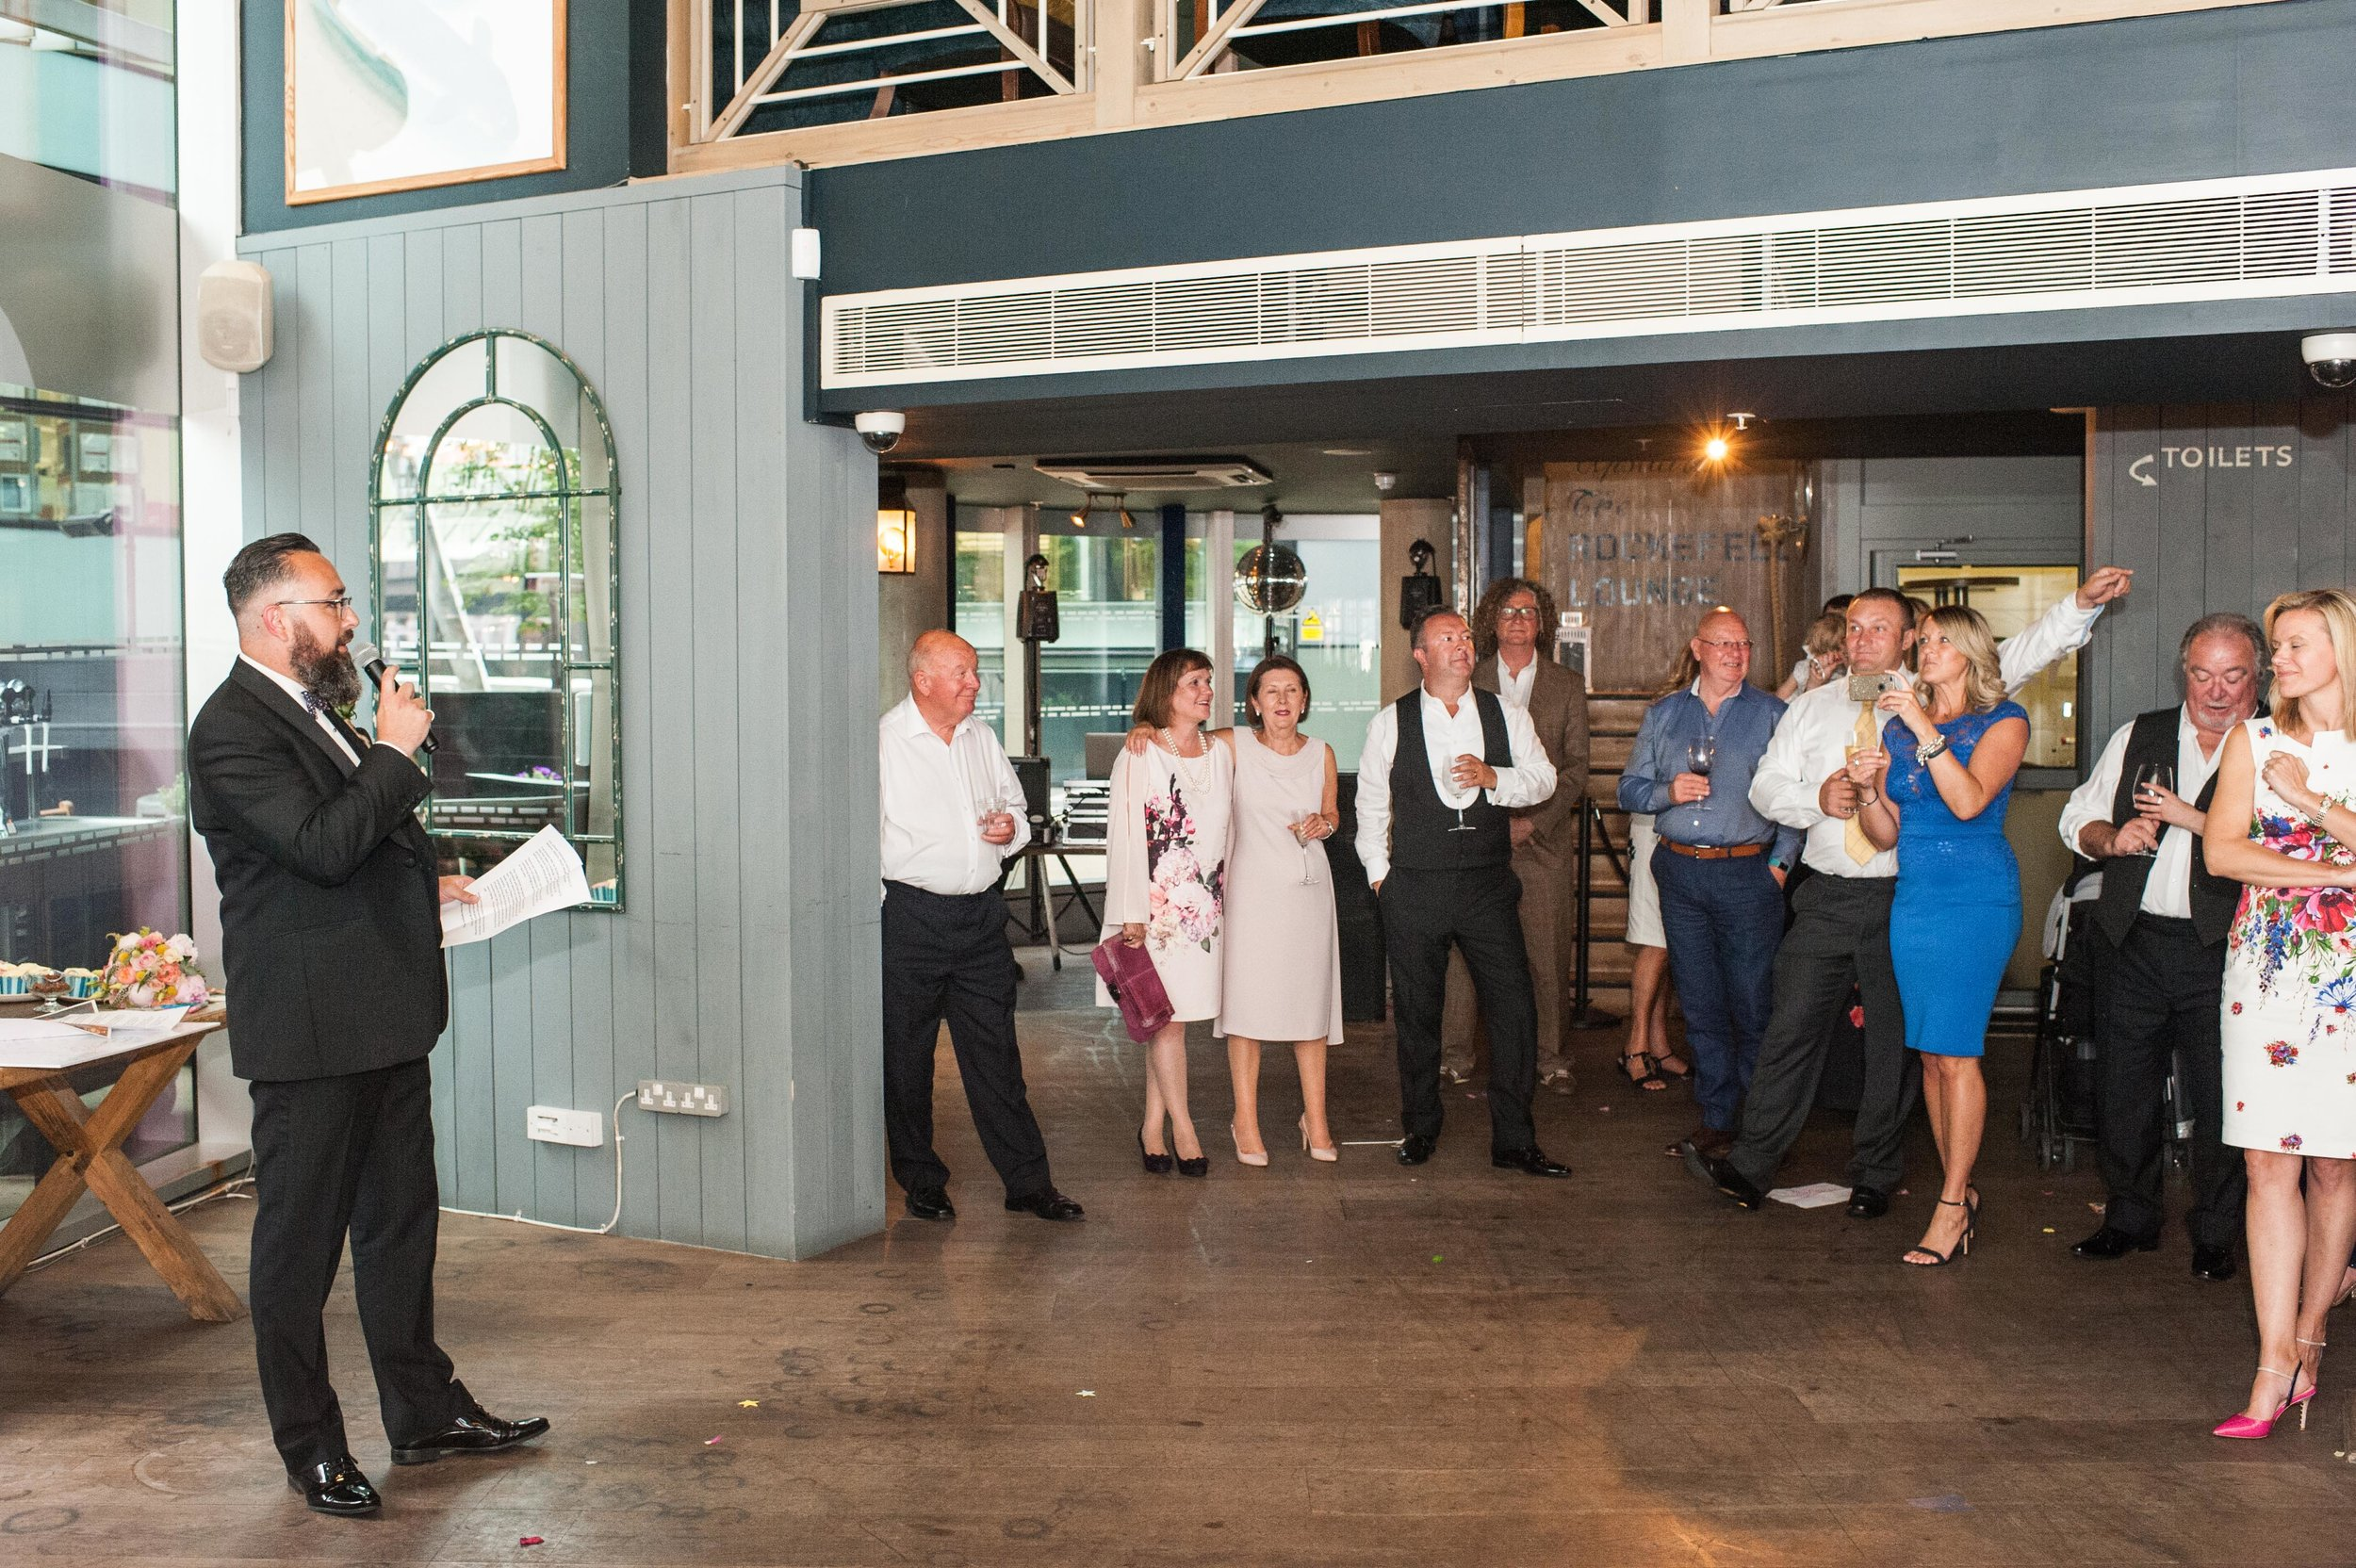 D&M_Marylebone Town Hall Wedding (229 of 239).jpg